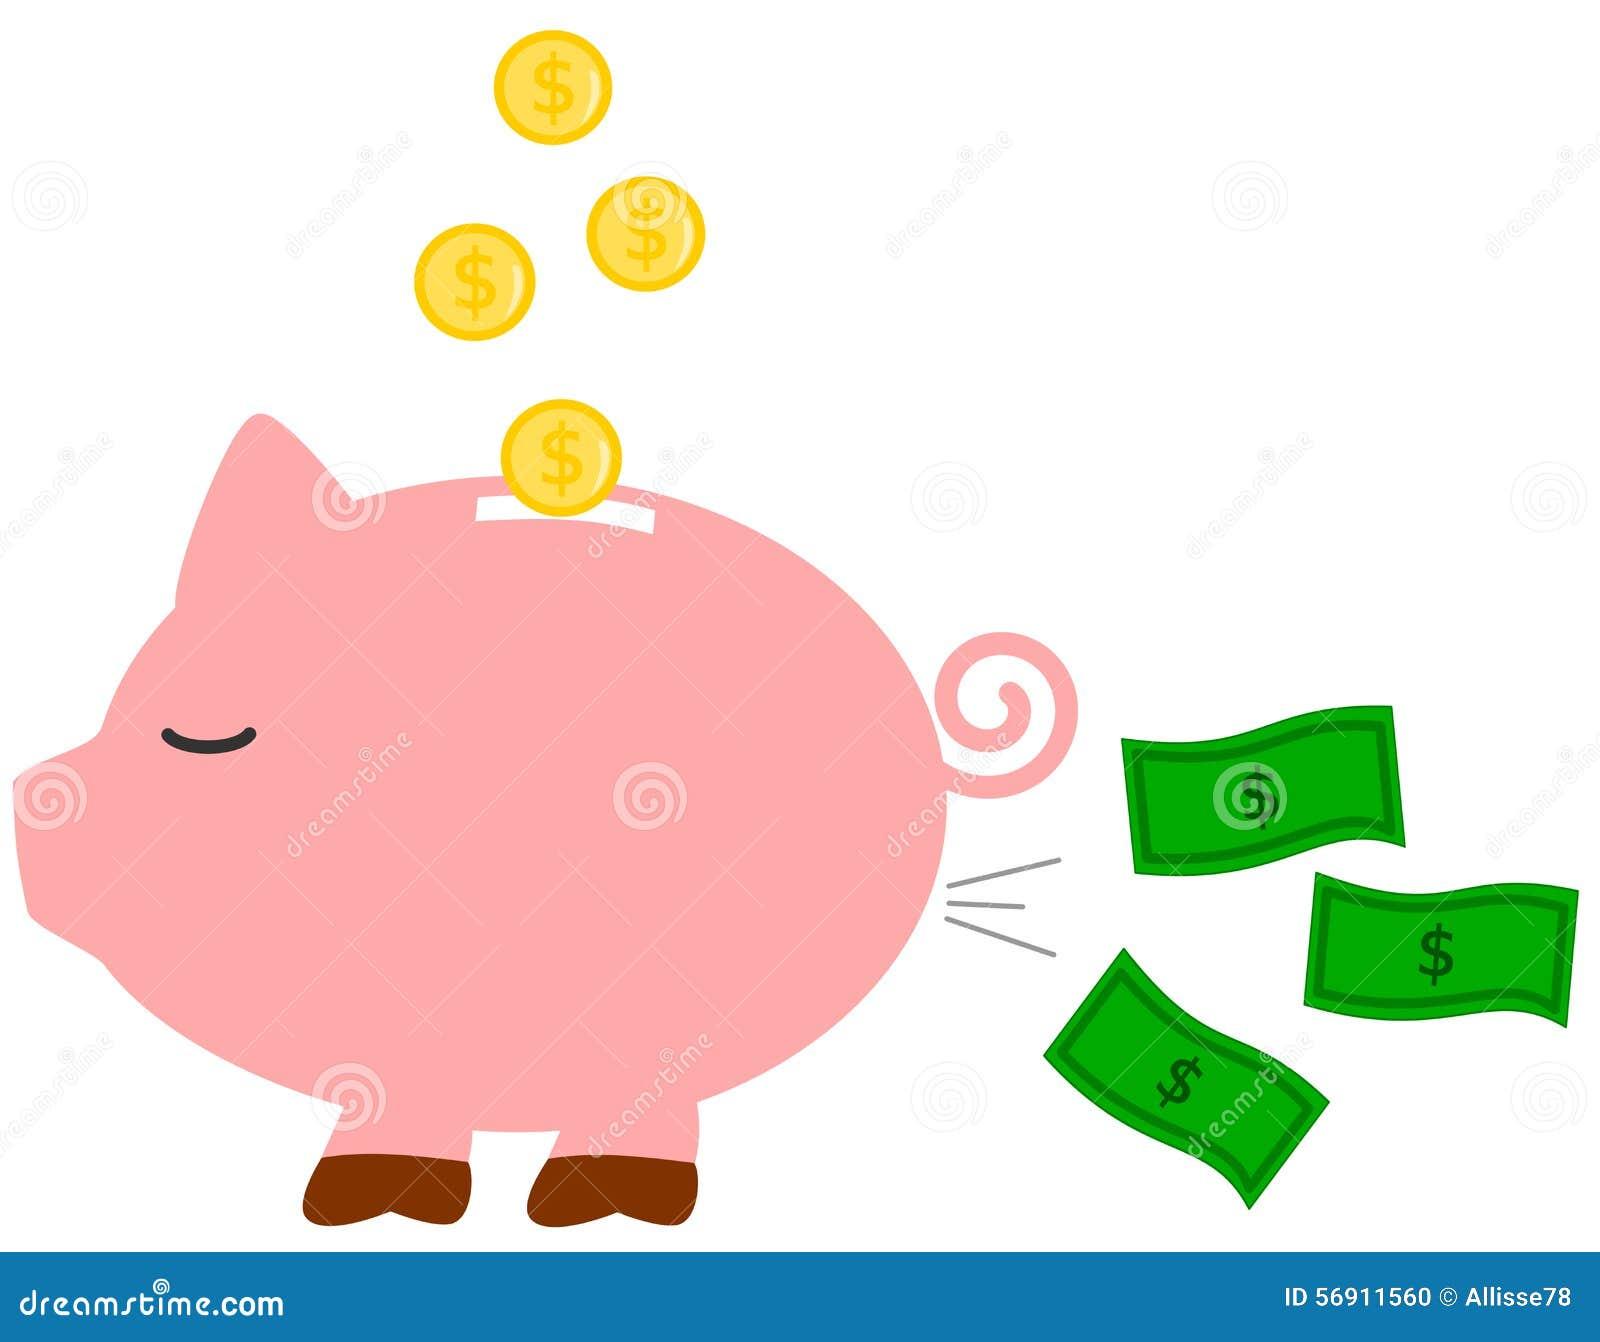 Funny Humor Cartoon Piggy Money Bank Concept Illustration